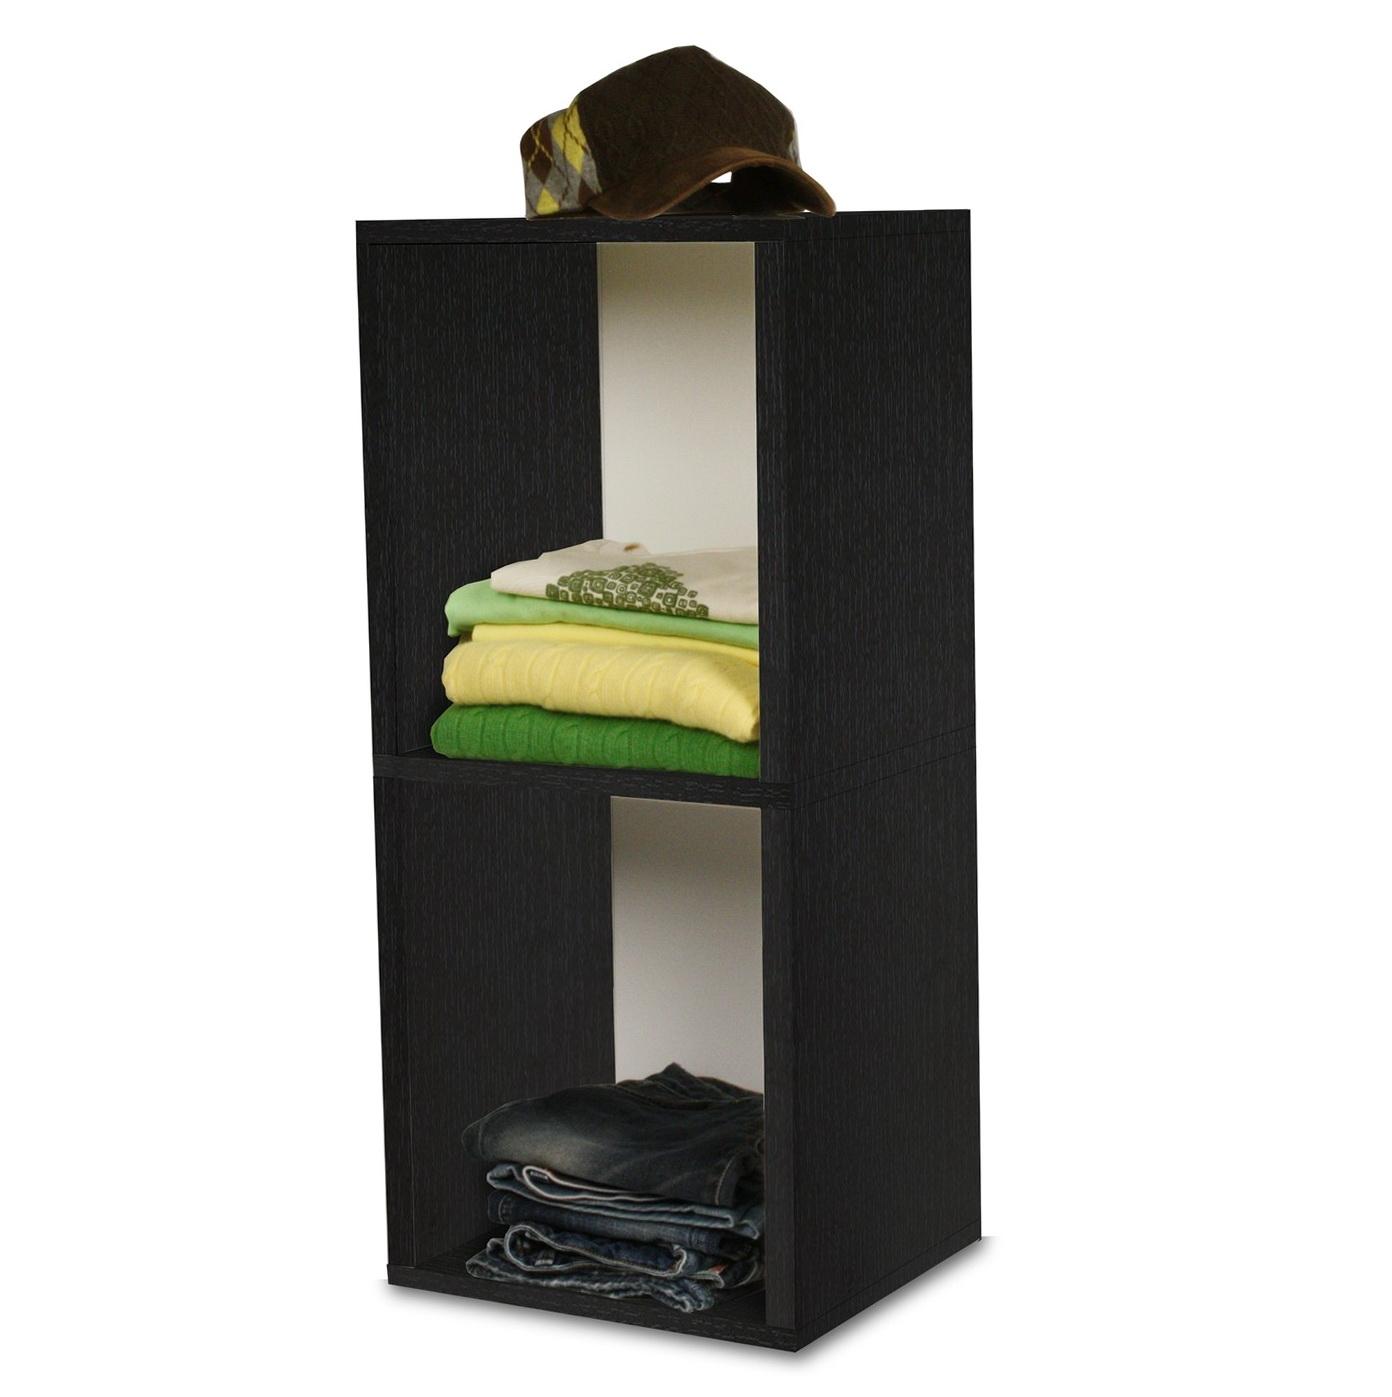 2 Shelf Bookcase Black